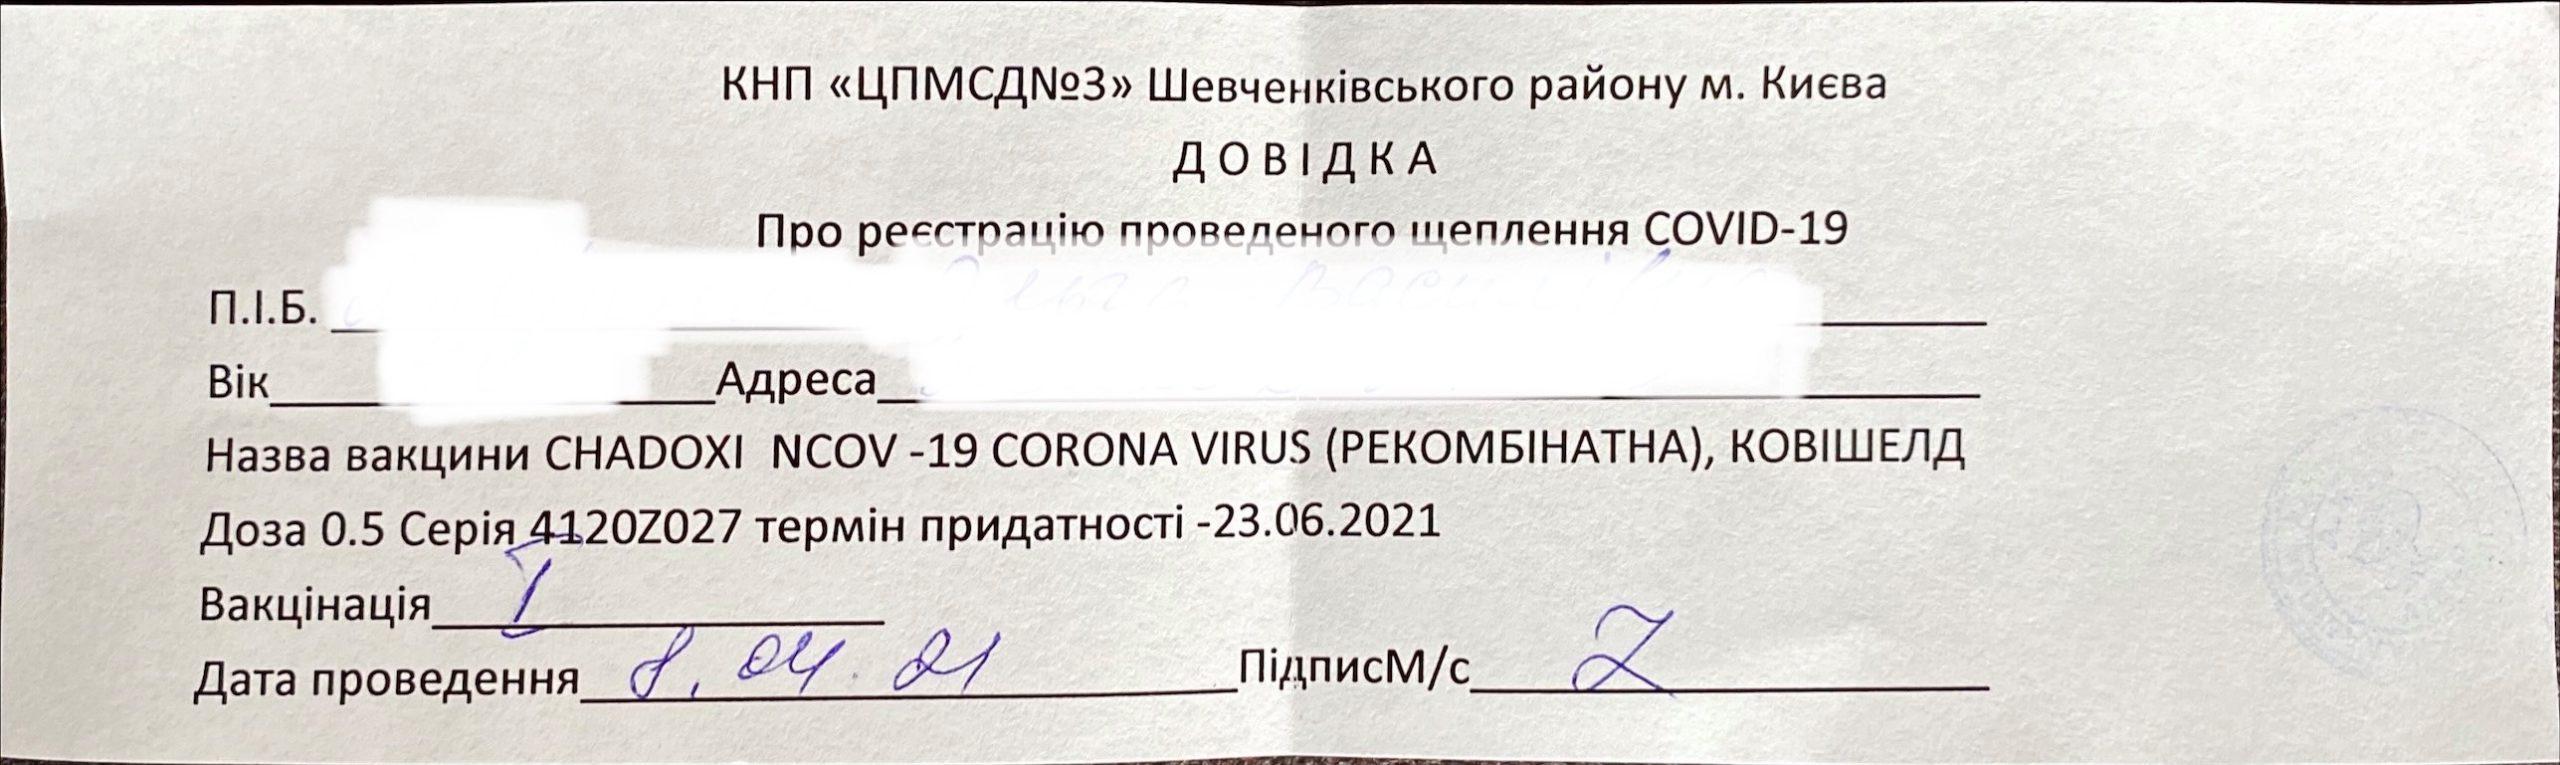 вакцинация довідка